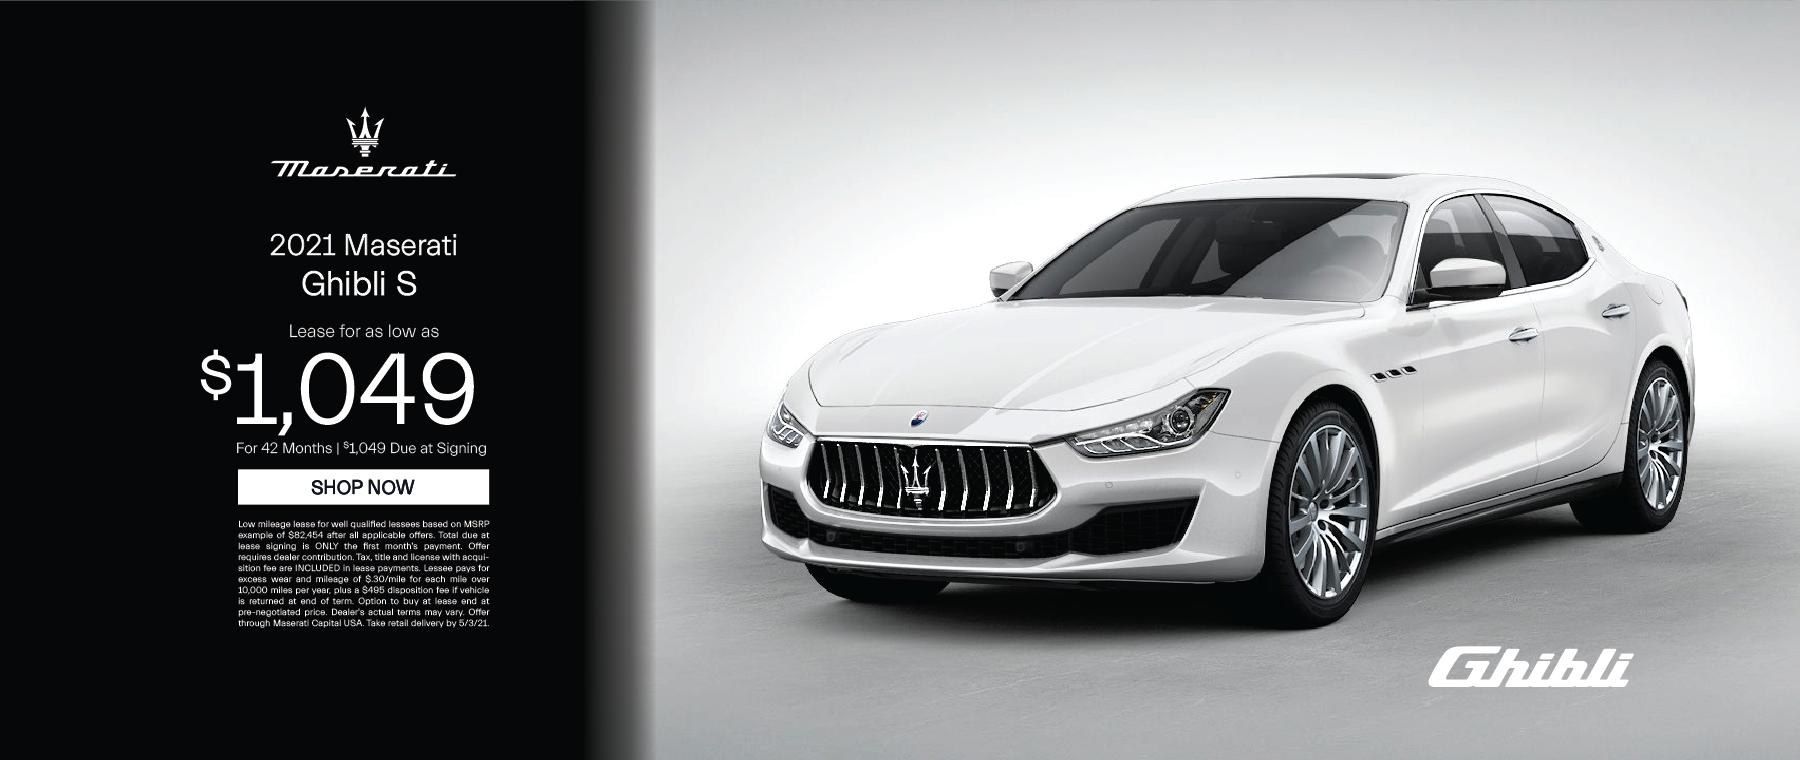 Essense Maserati – Ghilbil – April 2021